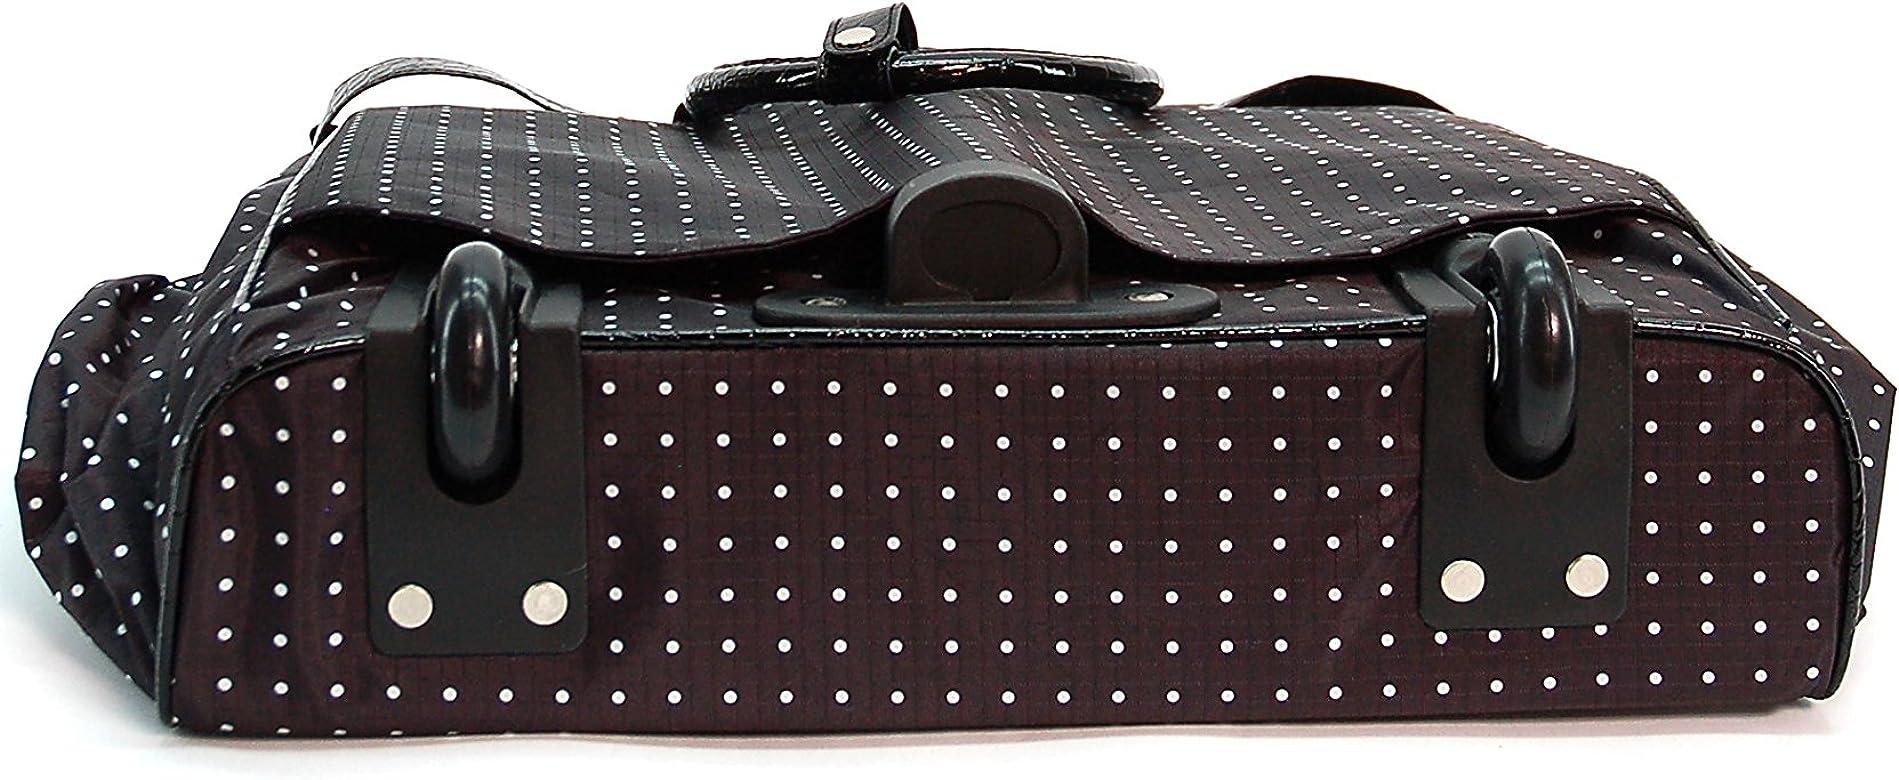 eb9d4fb77dcc Polka Dot Rolling Travel Tote Laptop Foldable Bag